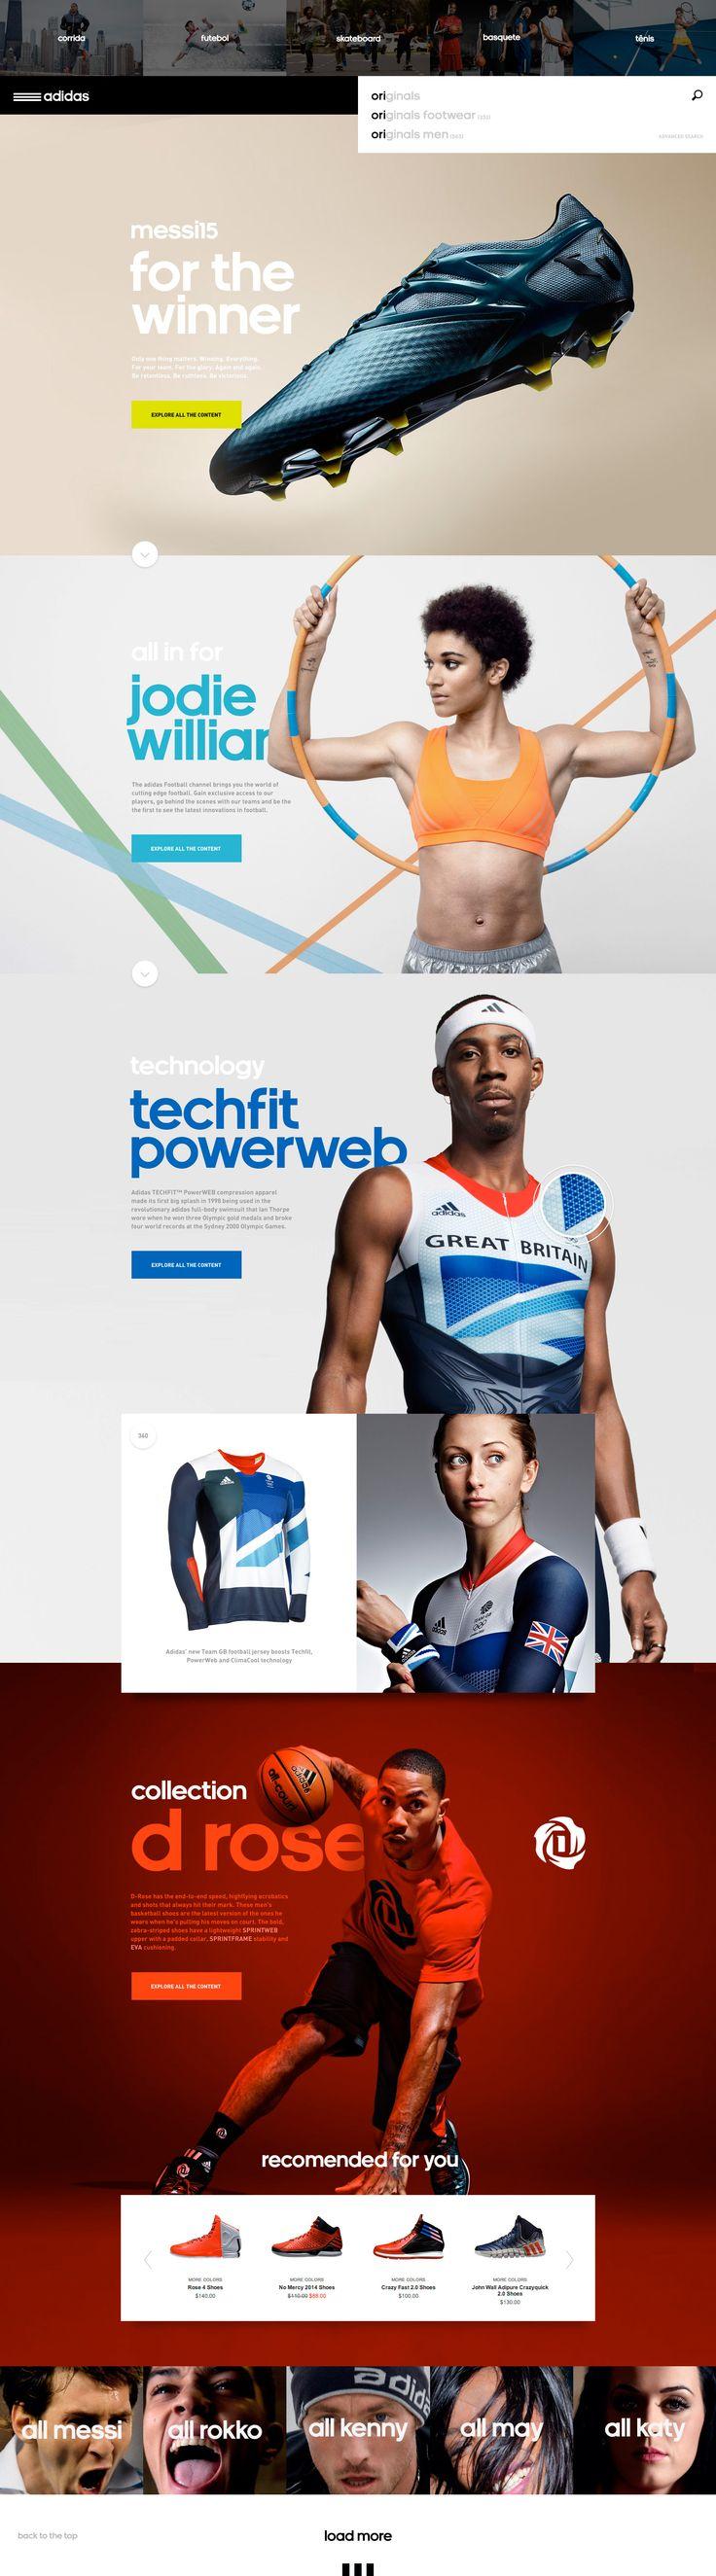 Adidas by Rafael Kfouri